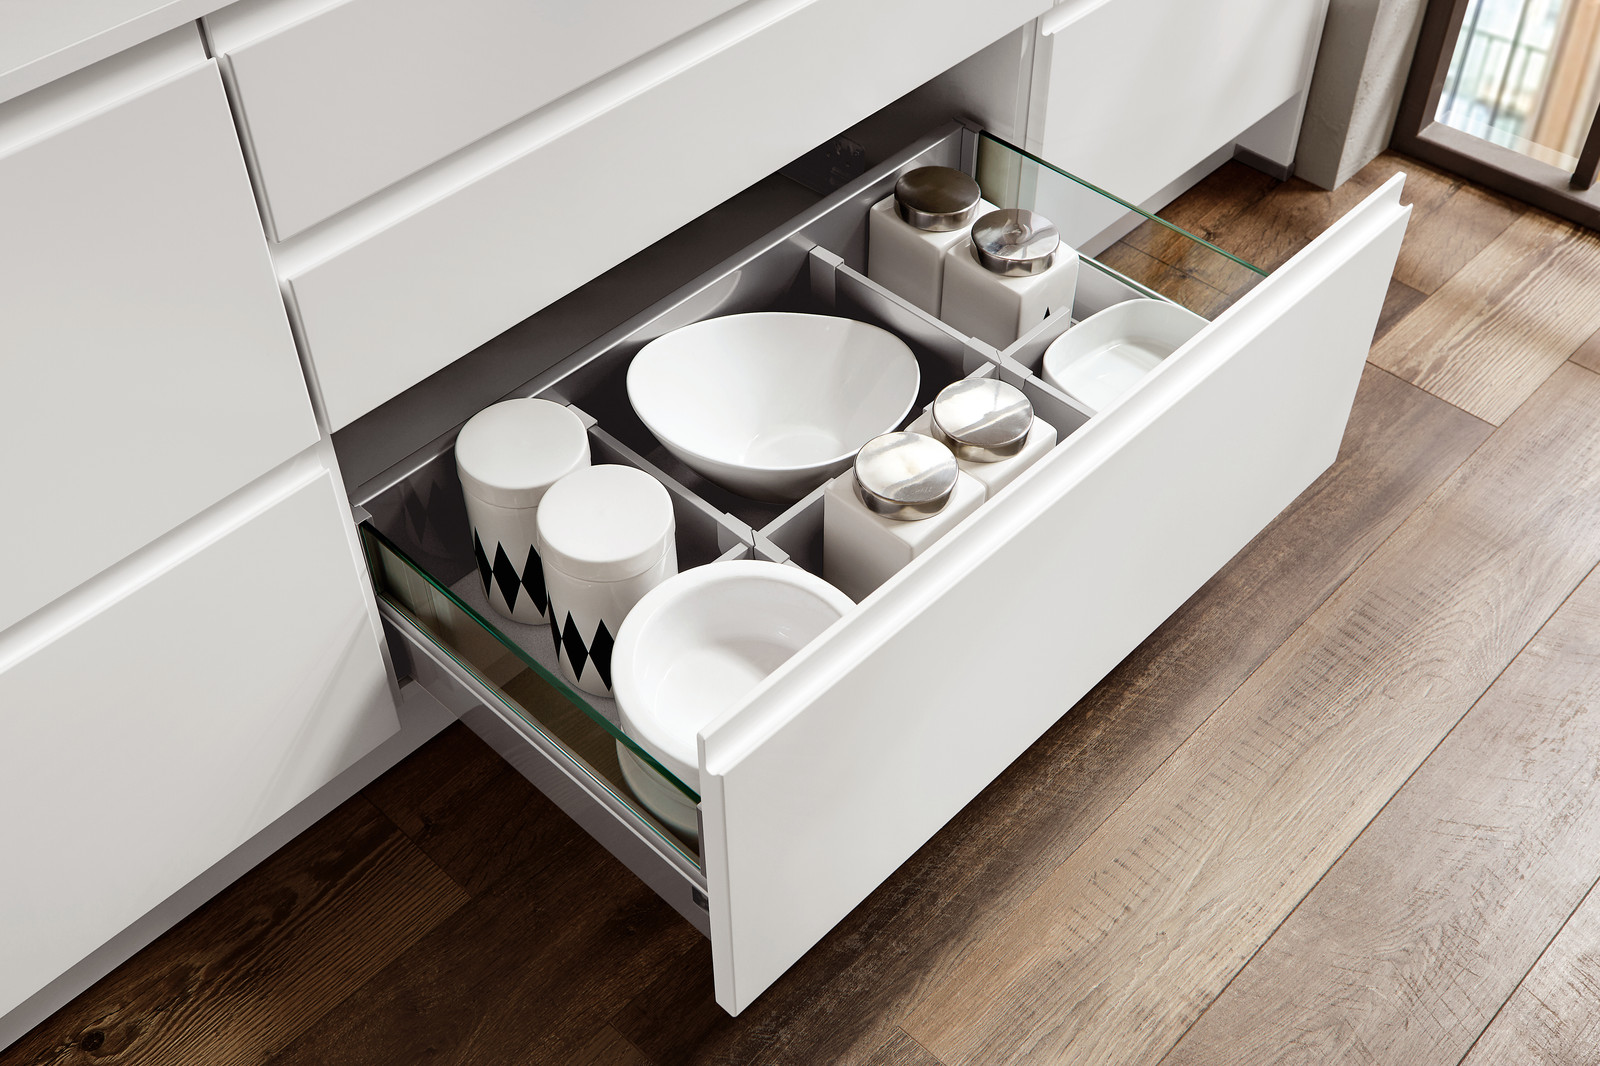 Kitchen Remodeling Katy | Bathroom Remodeling Katy | Houston | Texas